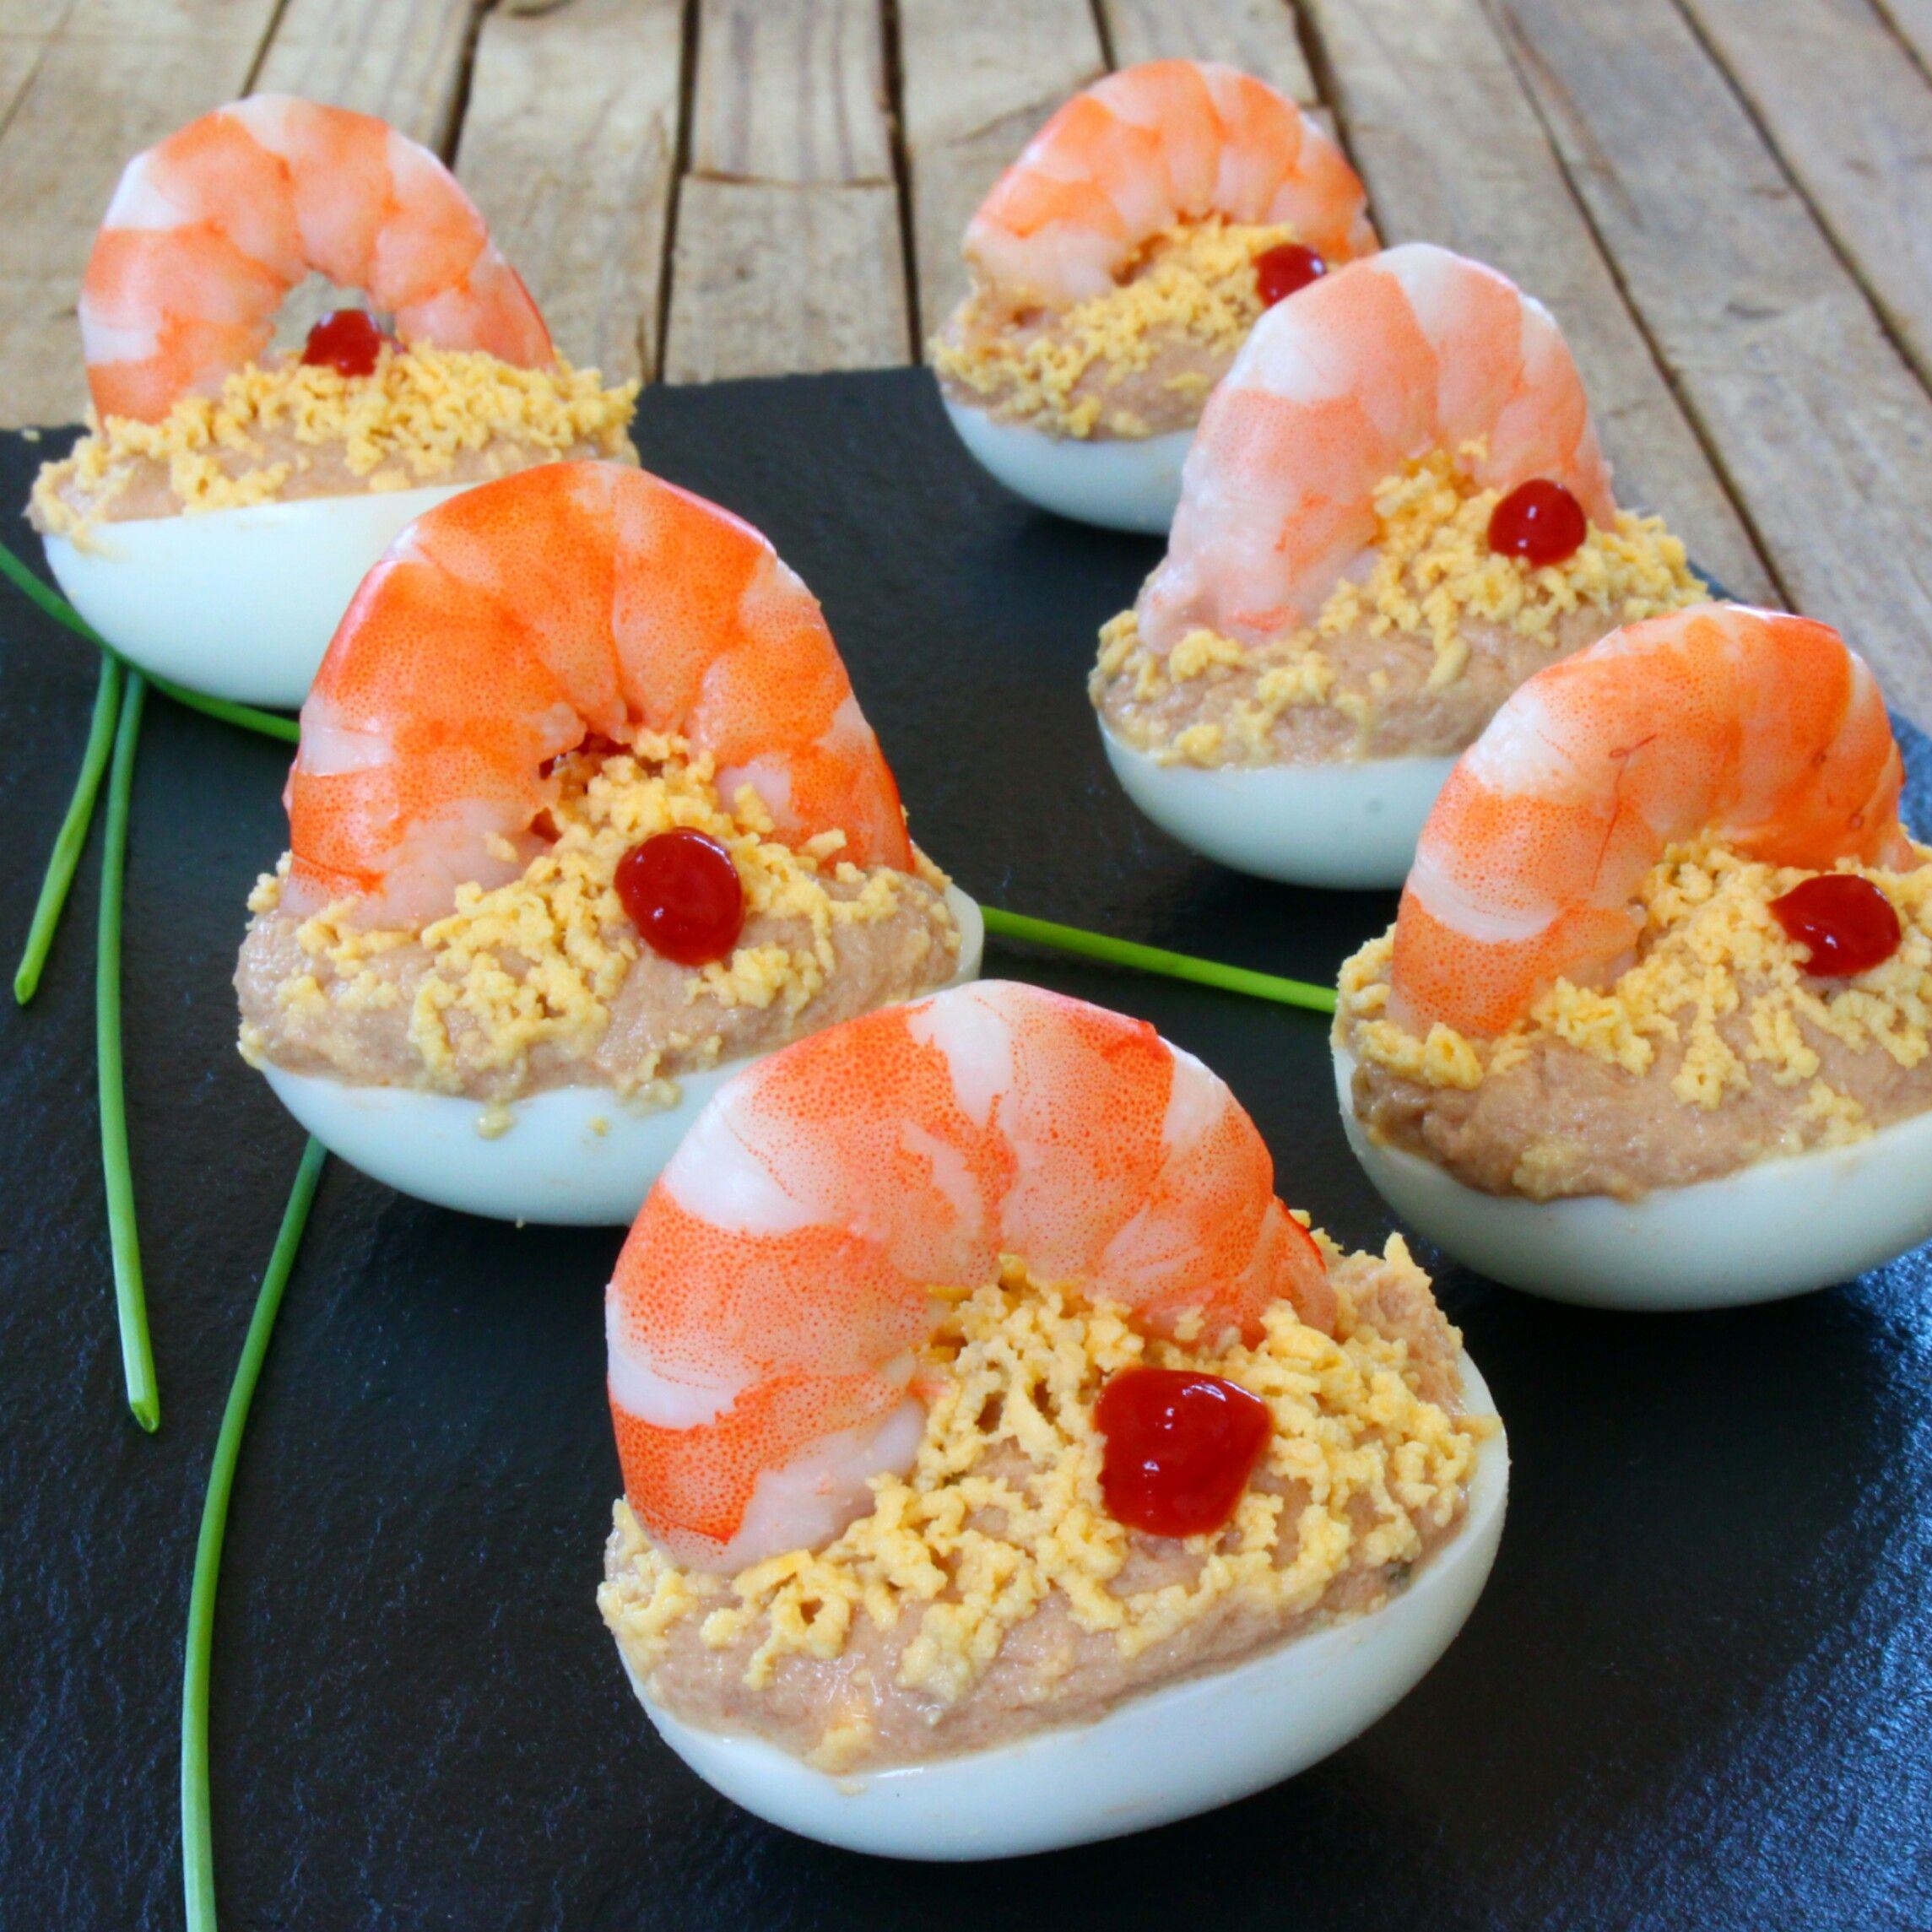 Recetas de huevos gourmet